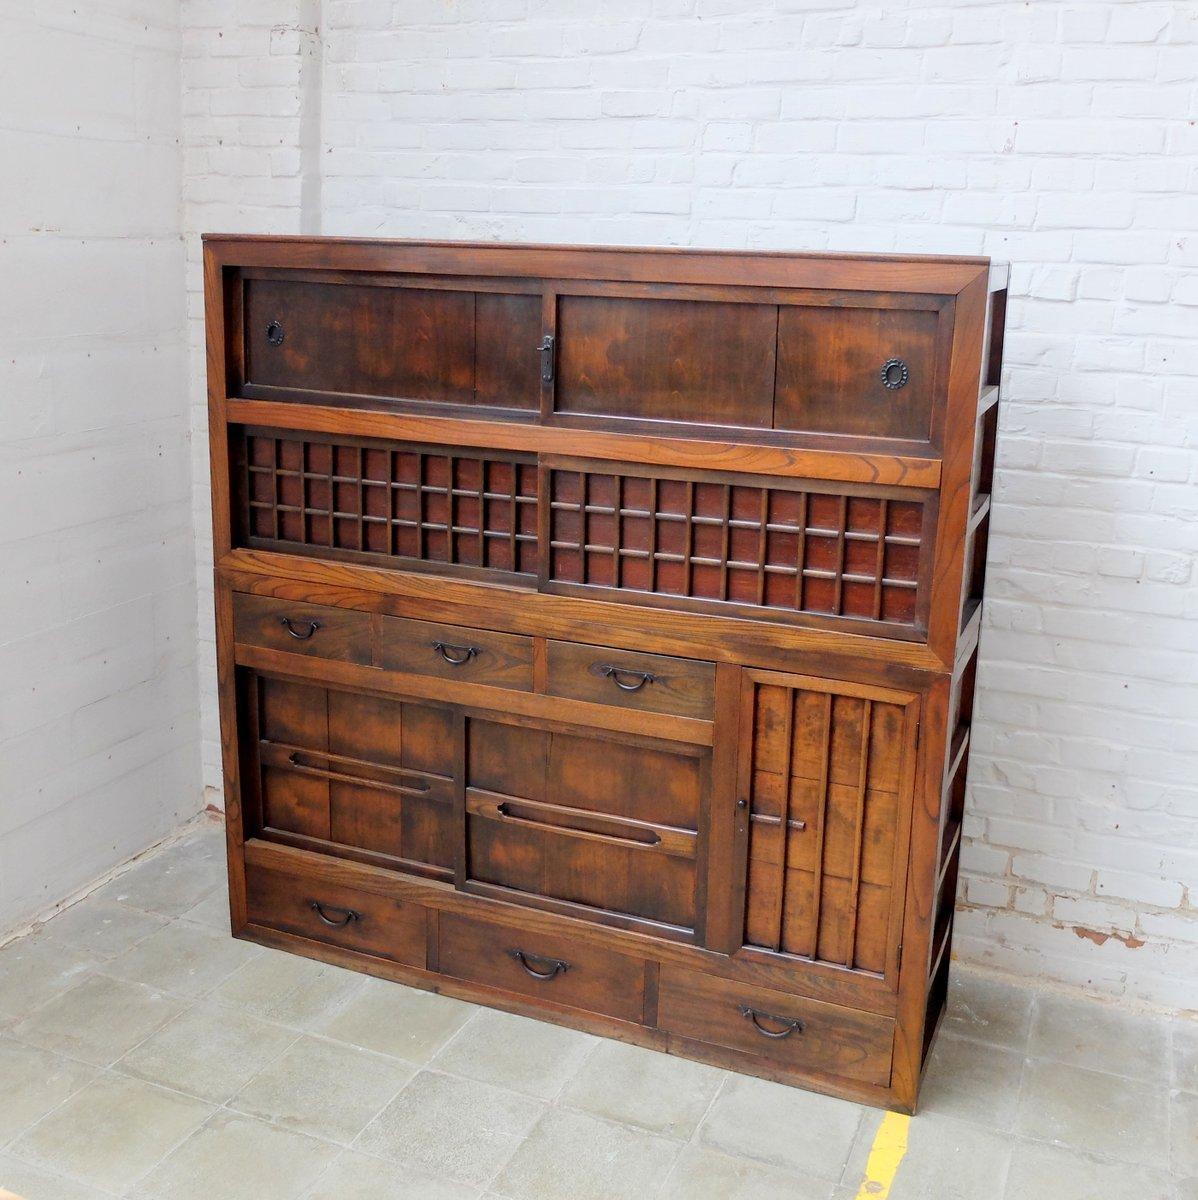 Antique Japanese Kitchen Cabinet 5. $5,322.00. Price per piece - Antique Japanese Kitchen Cabinet For Sale At Pamono